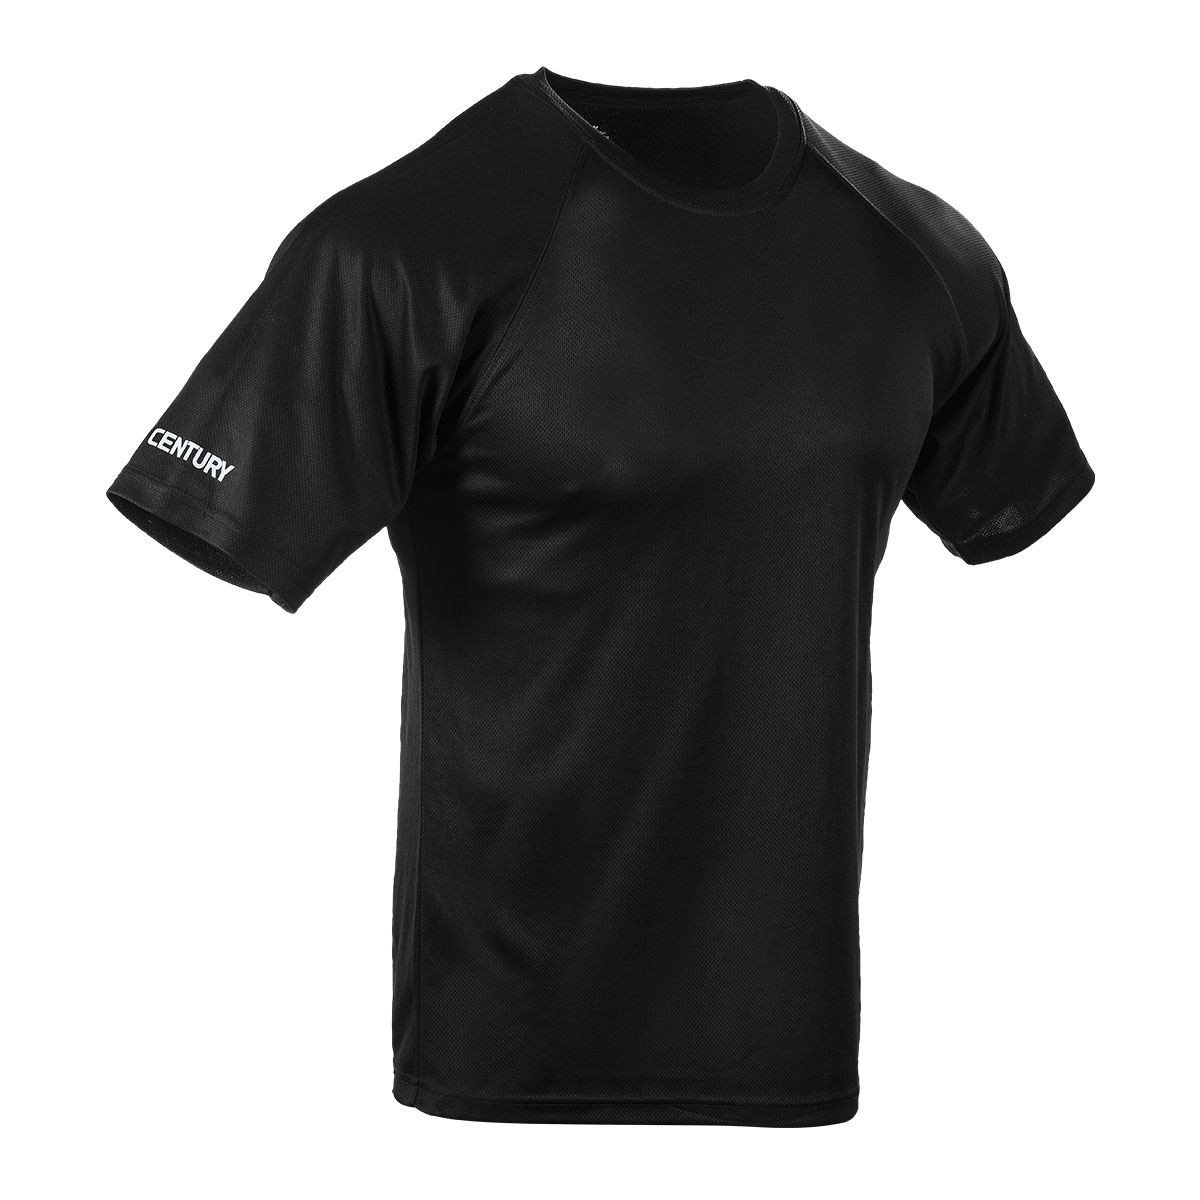 Men's Base Layer T Shirts c13042 by Century%2C LLC